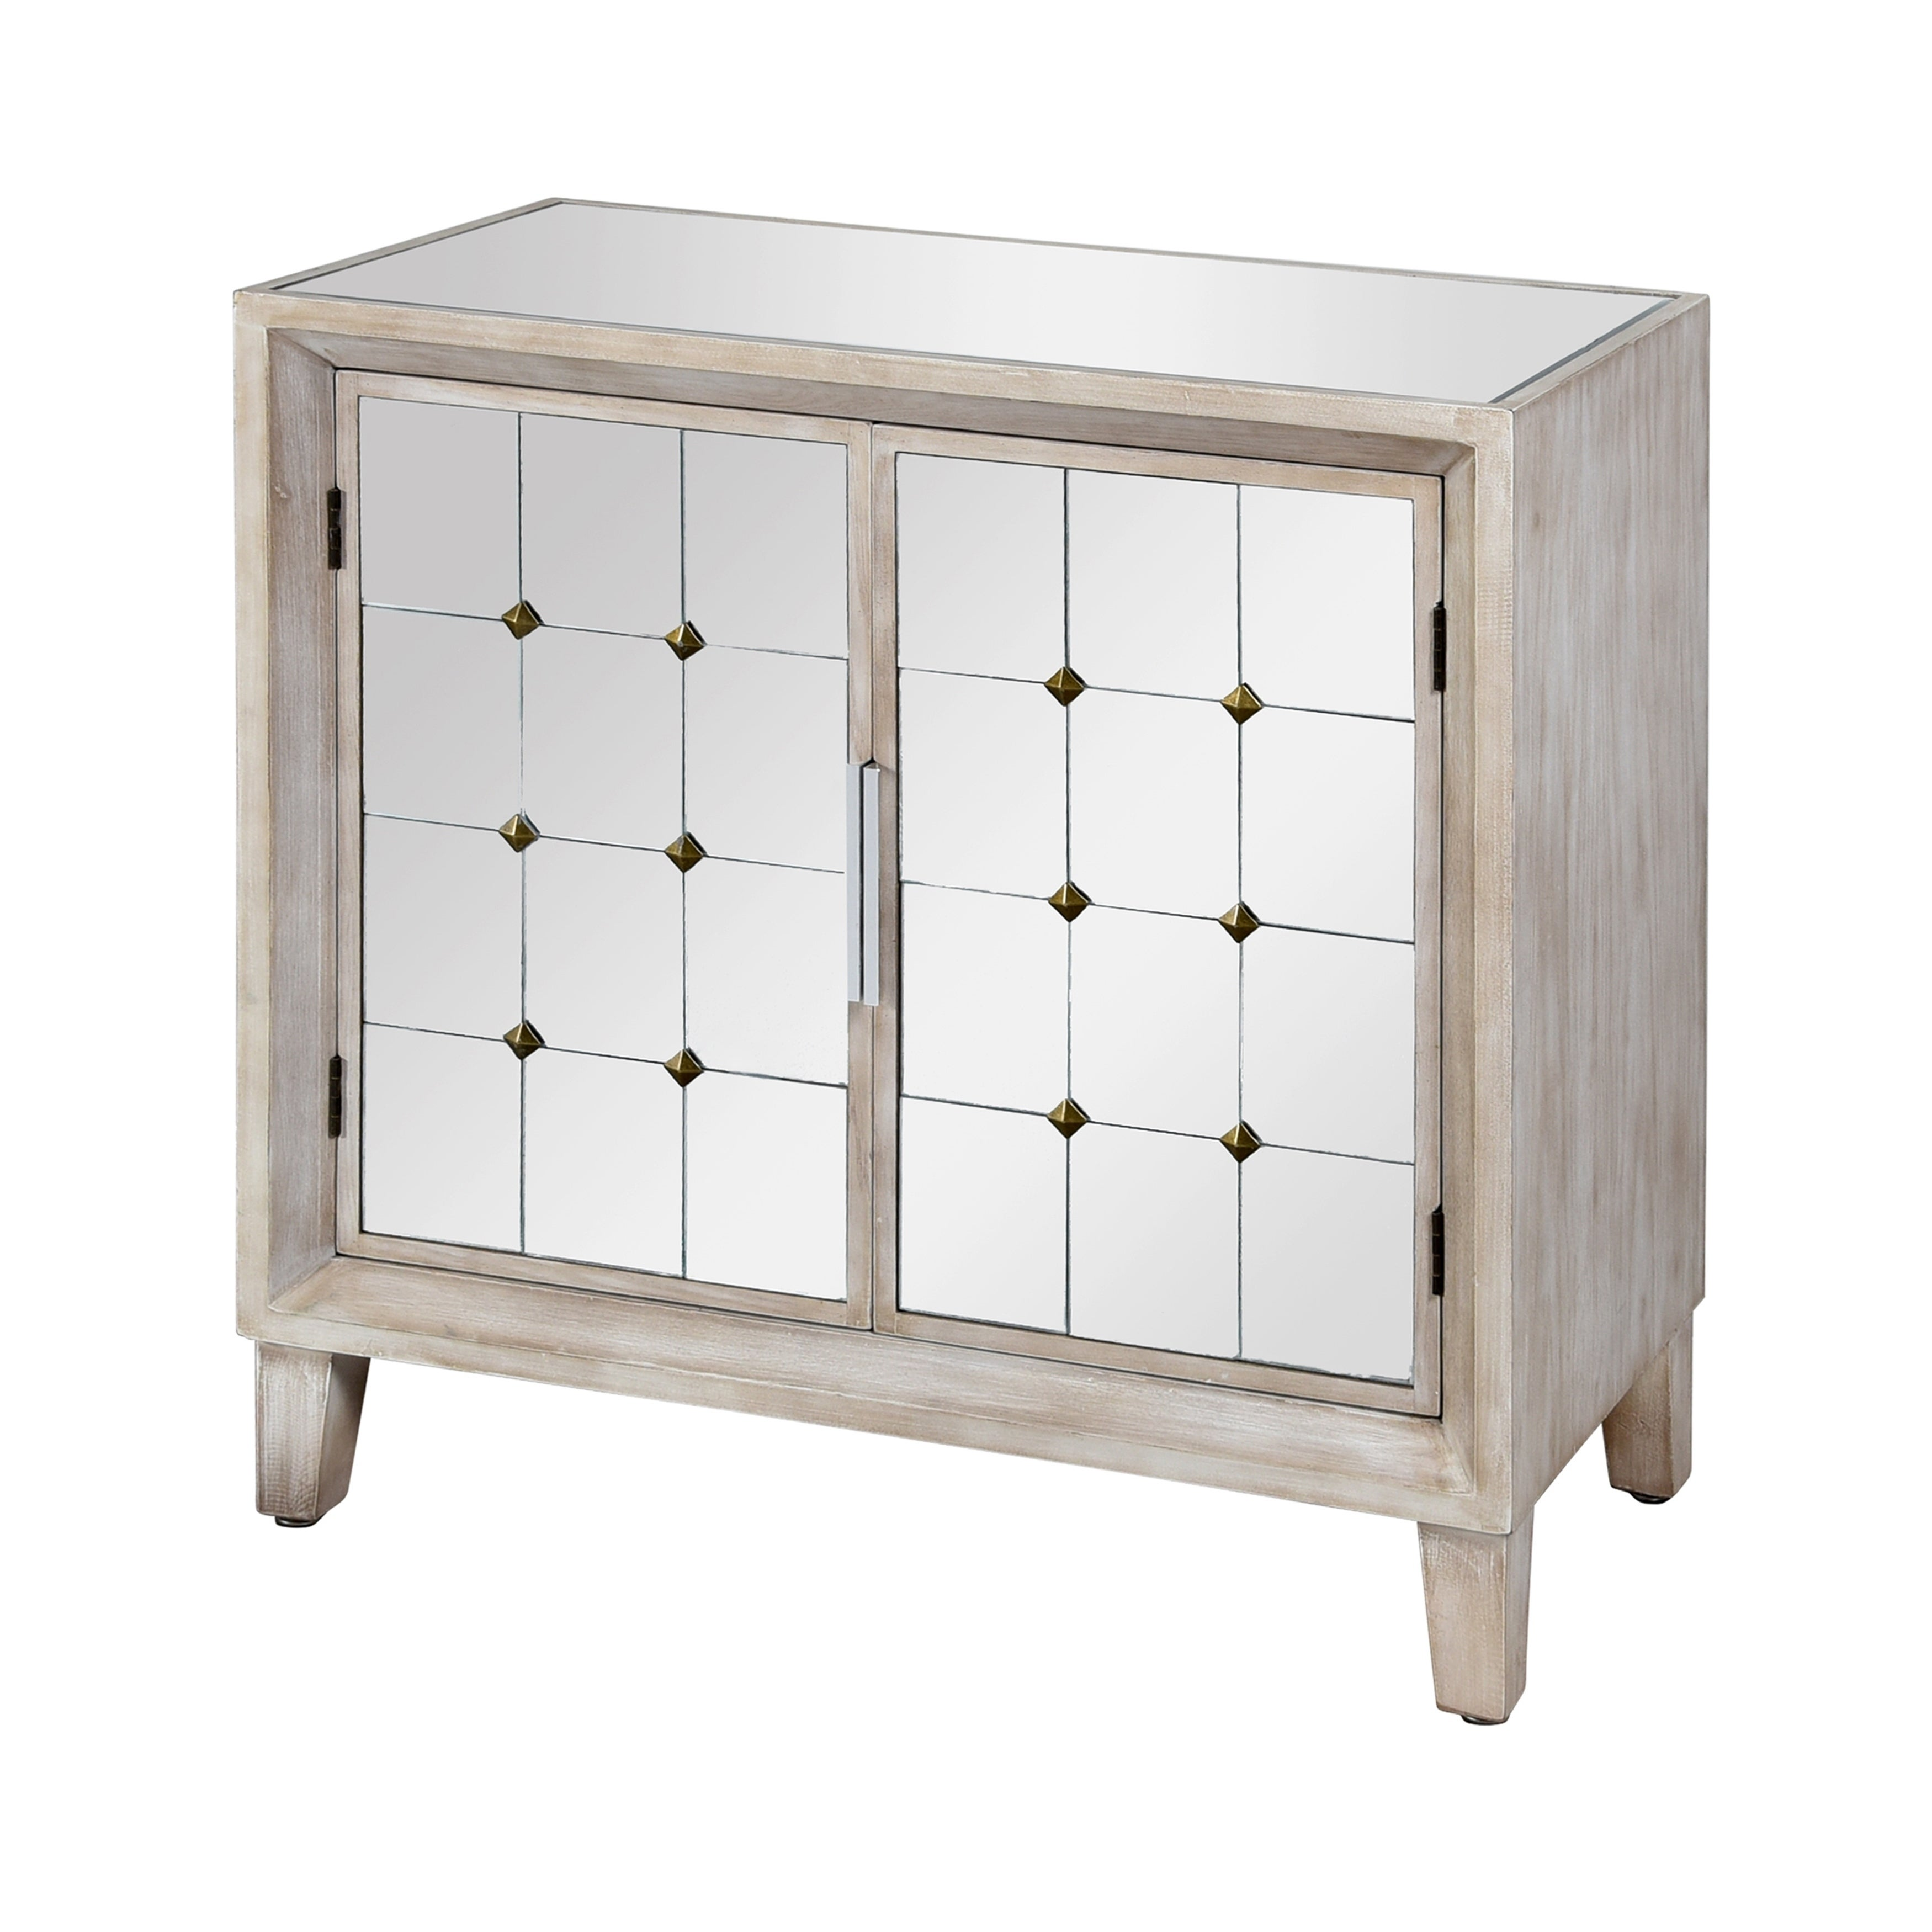 Shop Two Door Grey Ash Wooden Cabinet with Mirror Top Free